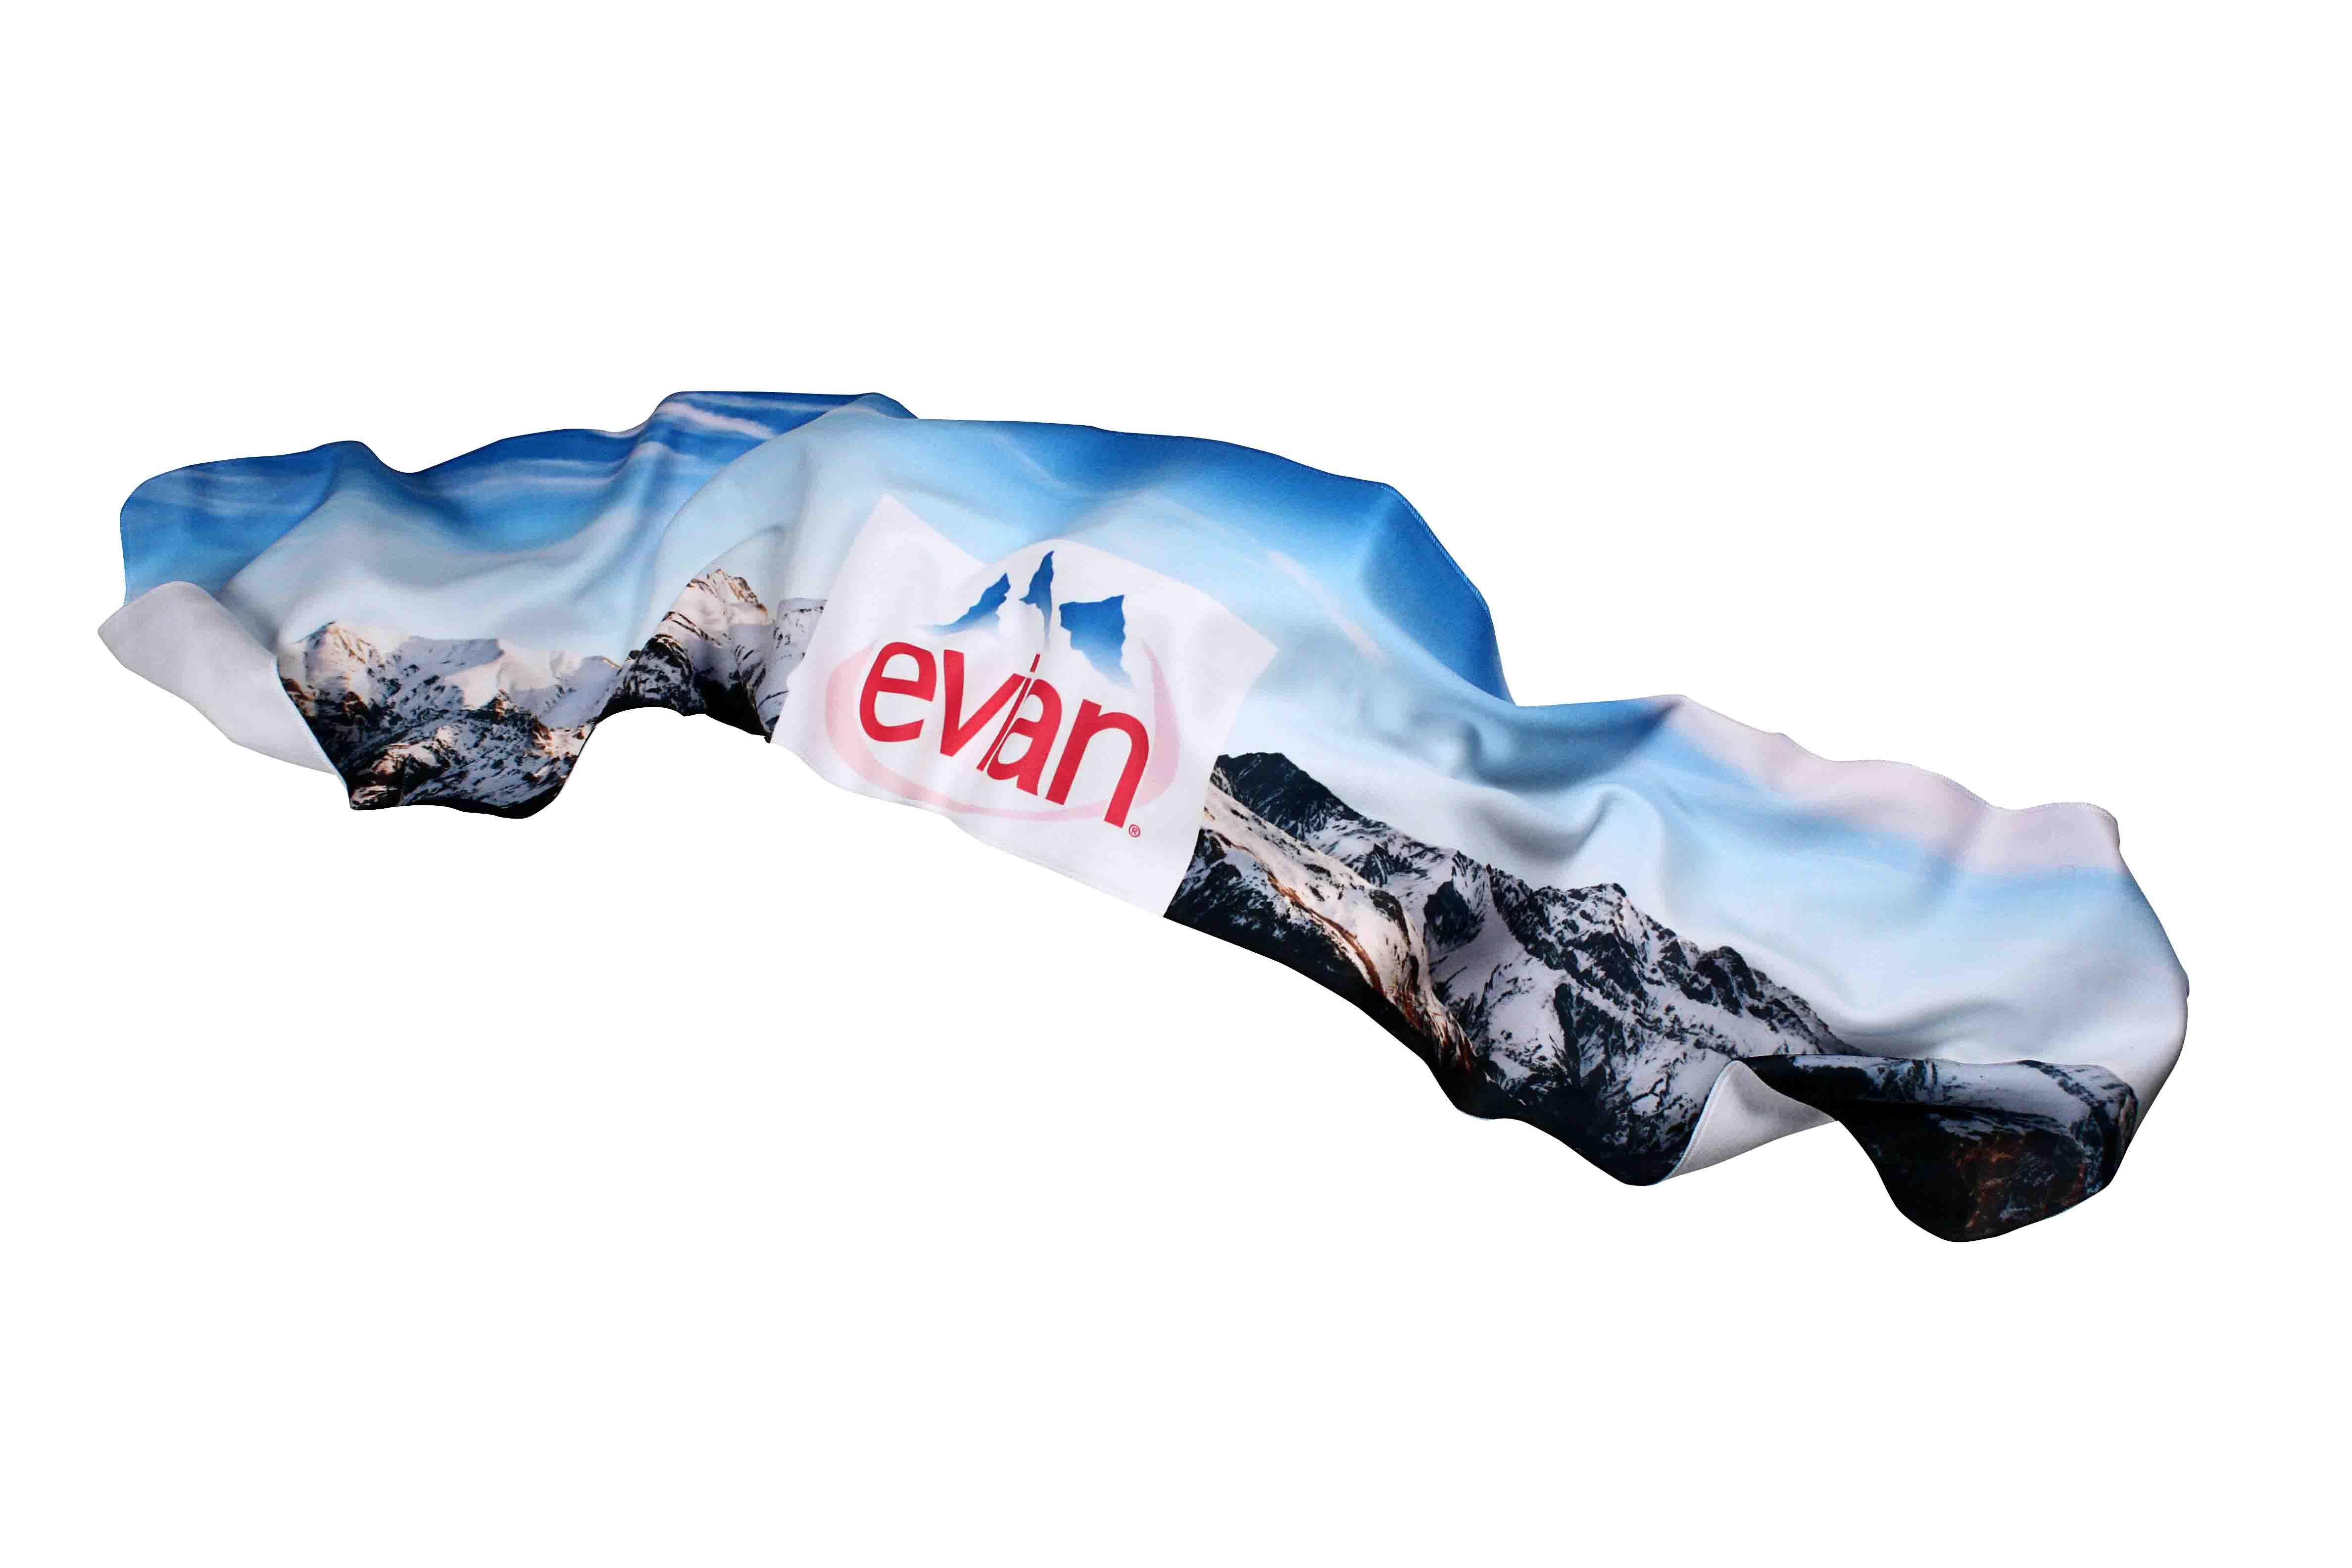 Echarpe publicitaire polaire hiver personnalisee